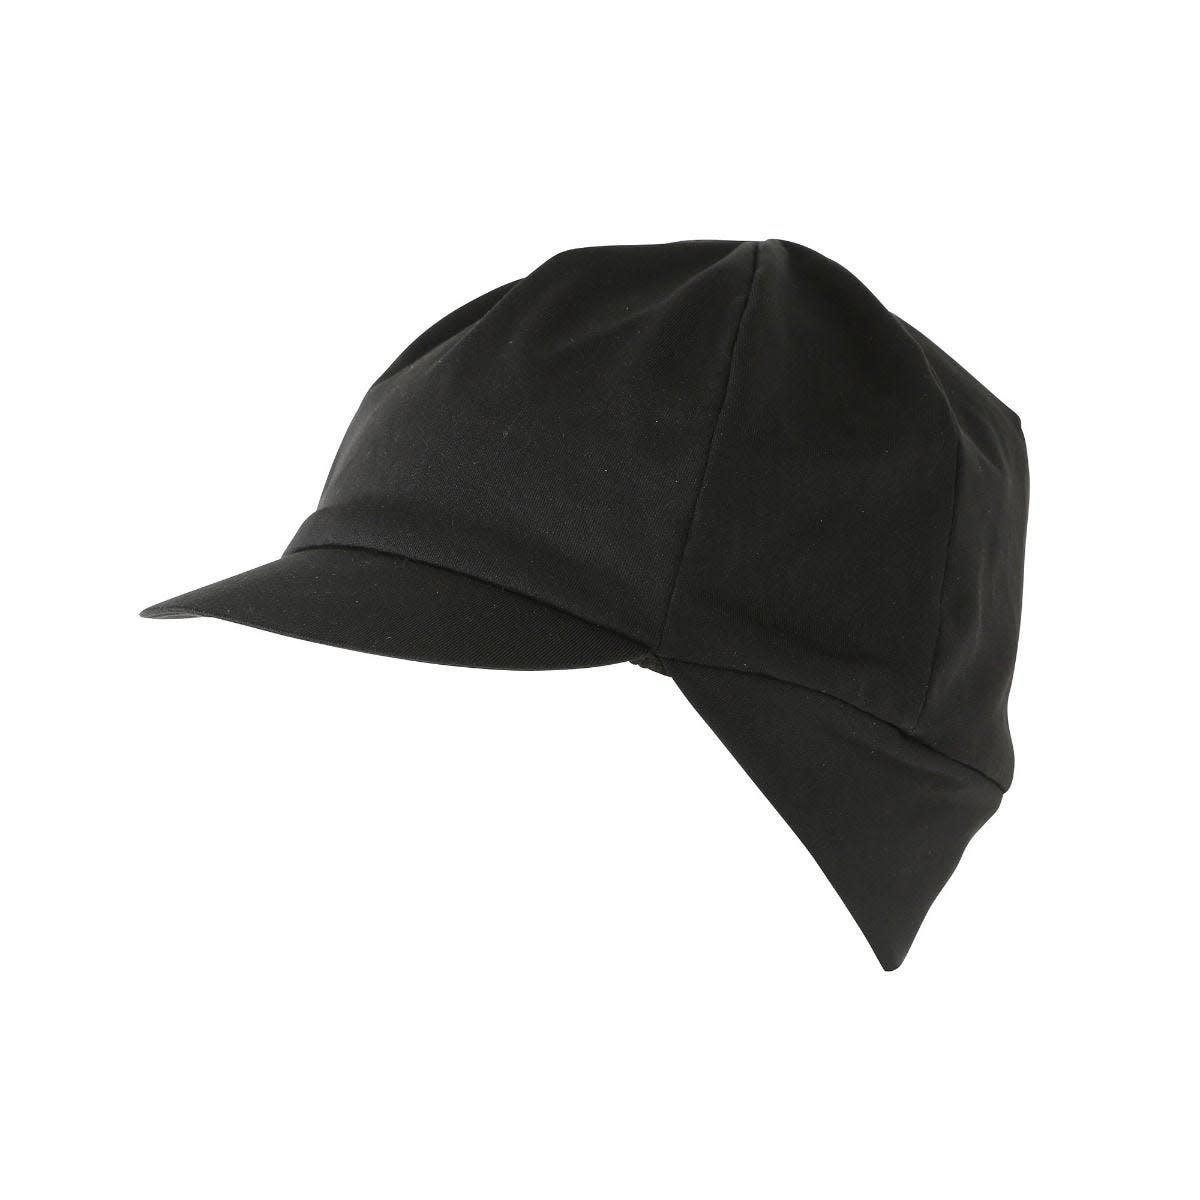 ETC Arid Winter Sports Cap One Size